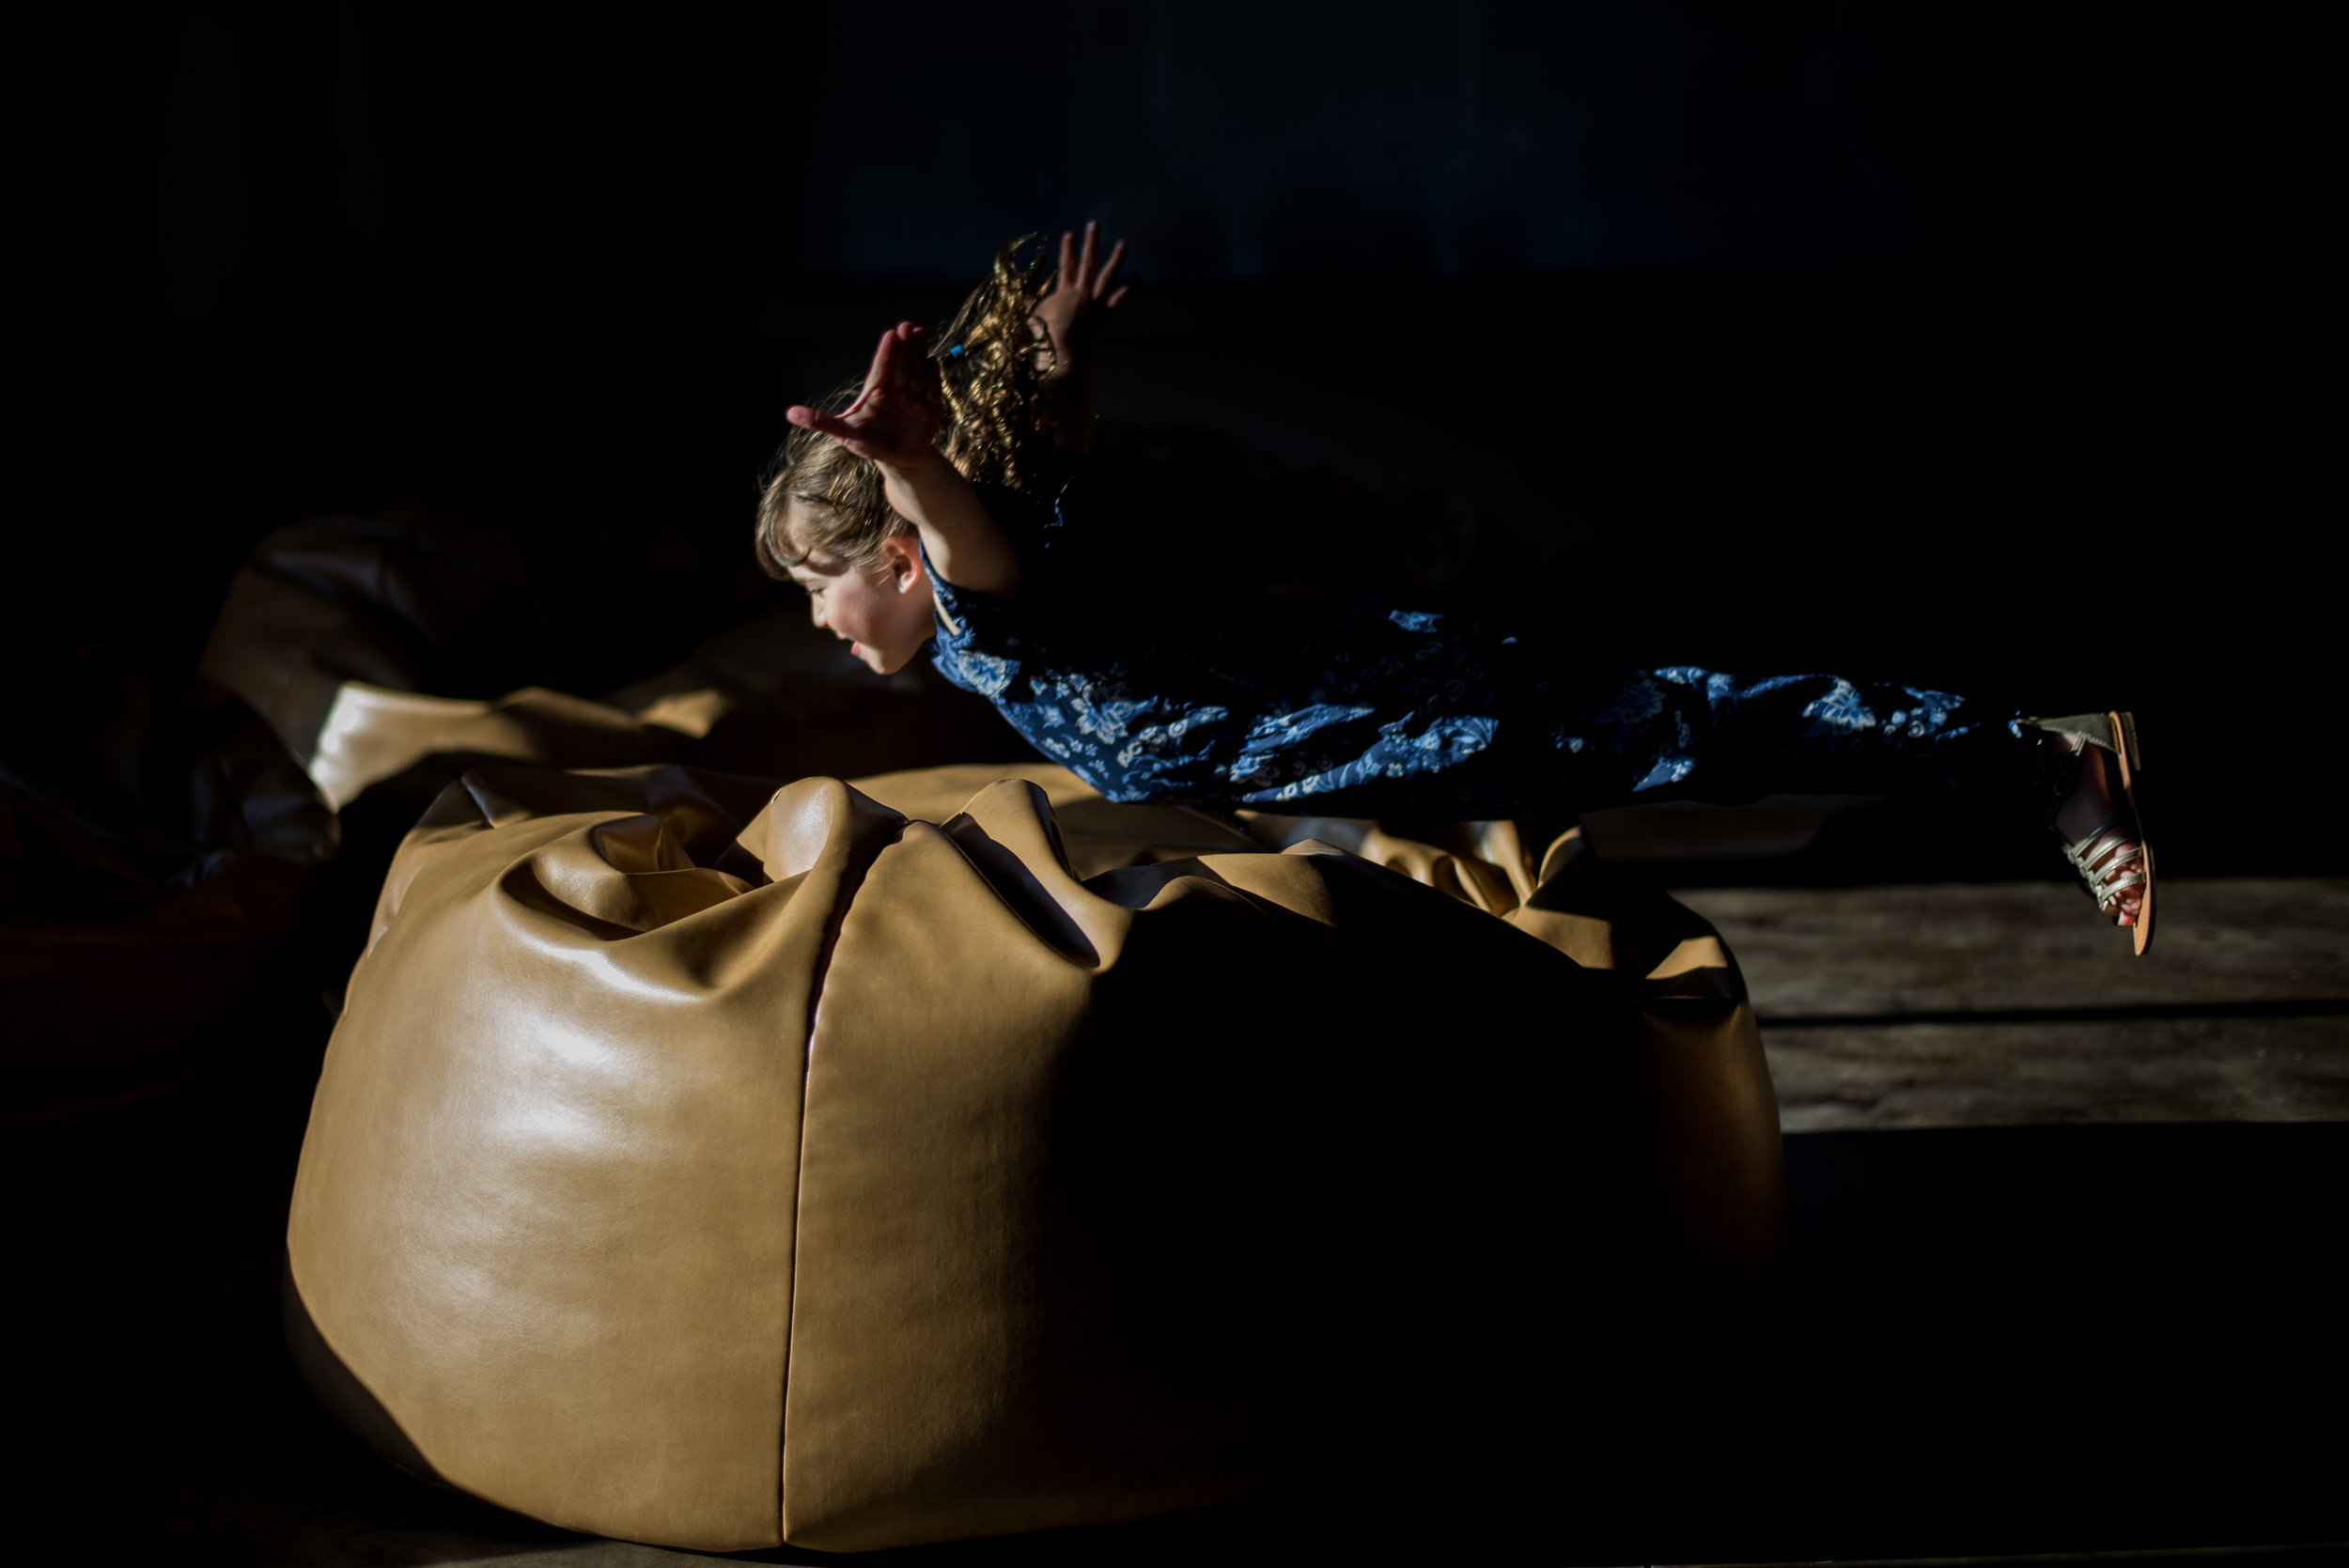 San Francisco based photographer, Amanda Anderson, went to Sonoma, CA for a Blair & Thurston Retreat